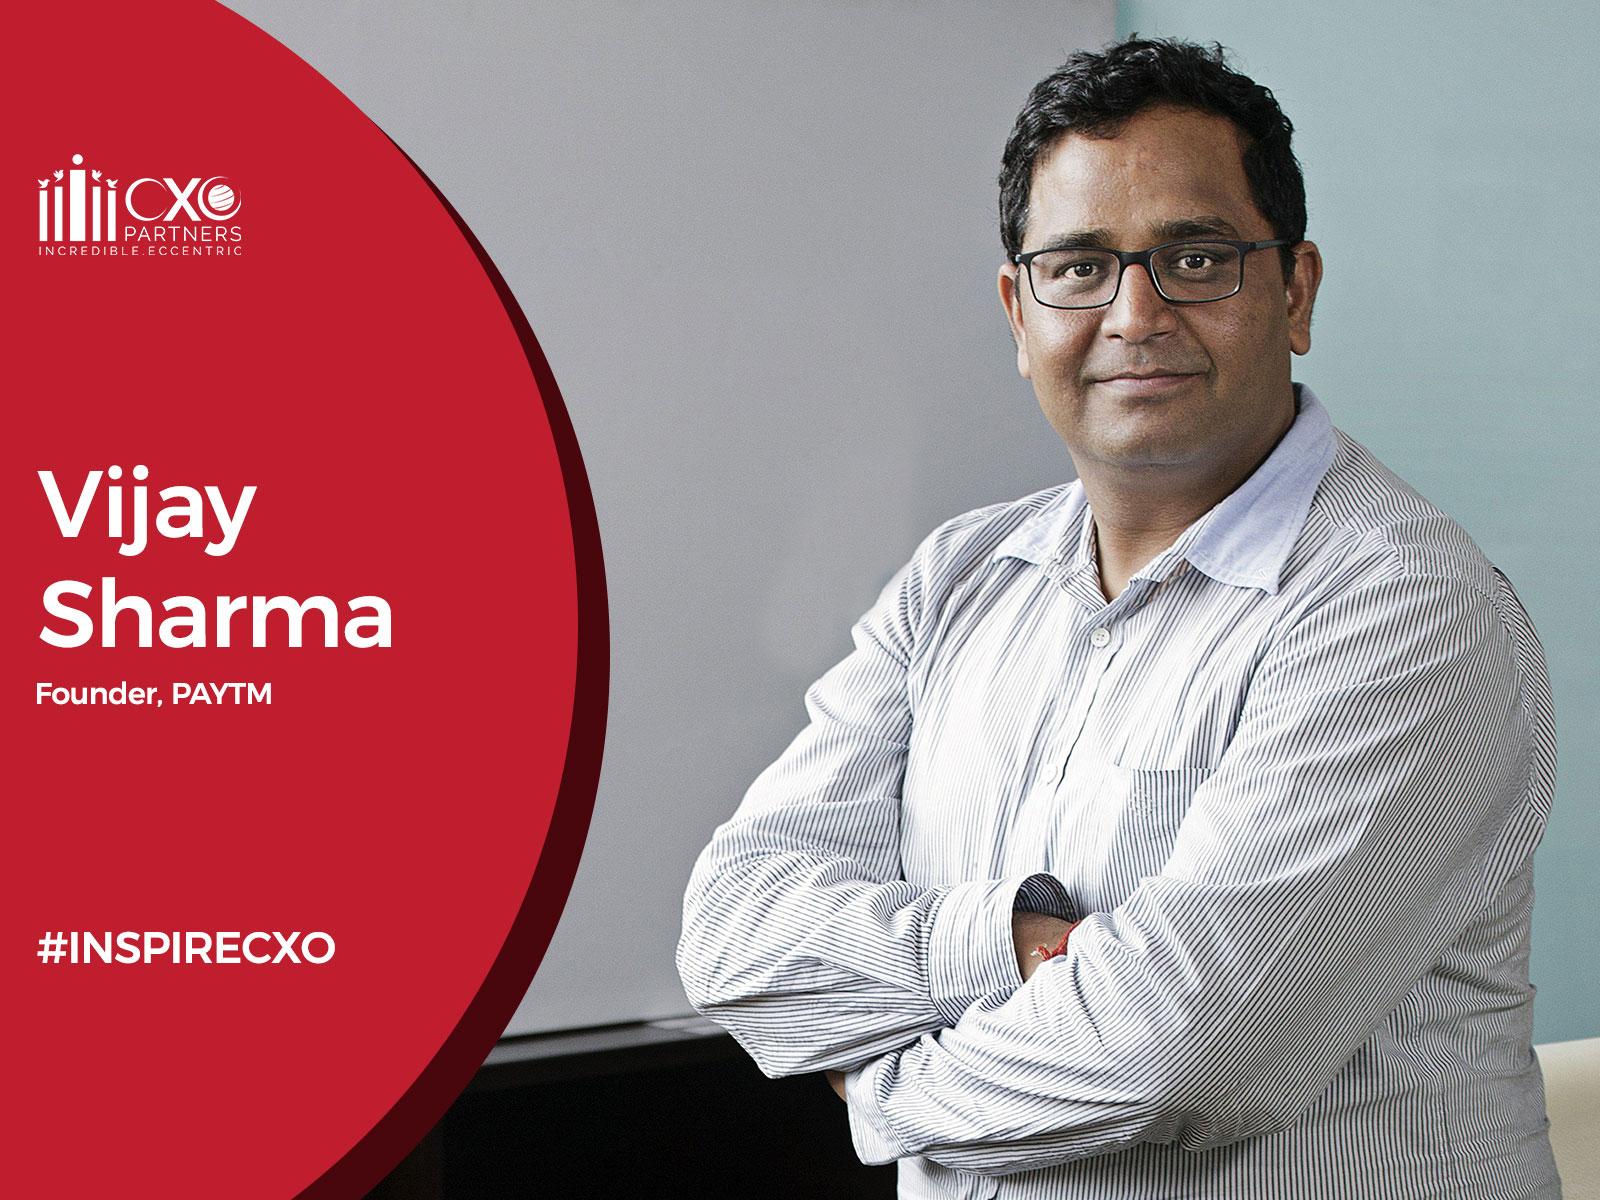 Paytm - Vijay Sharma - INSPIRECXO